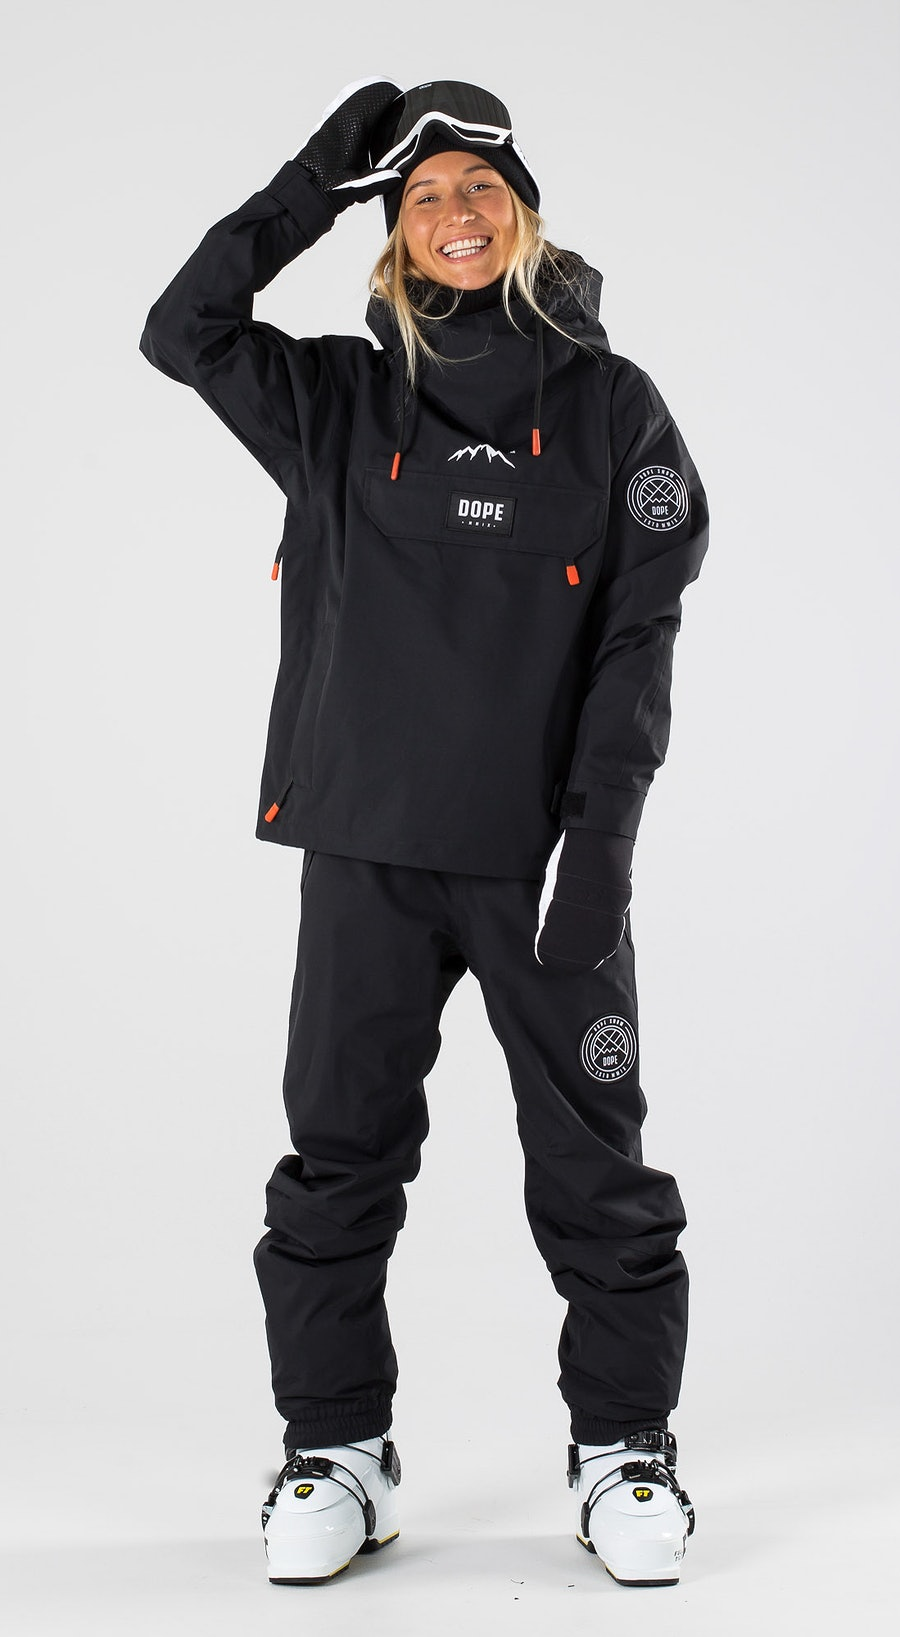 Dope Blizzard W Black Ski clothing Multi